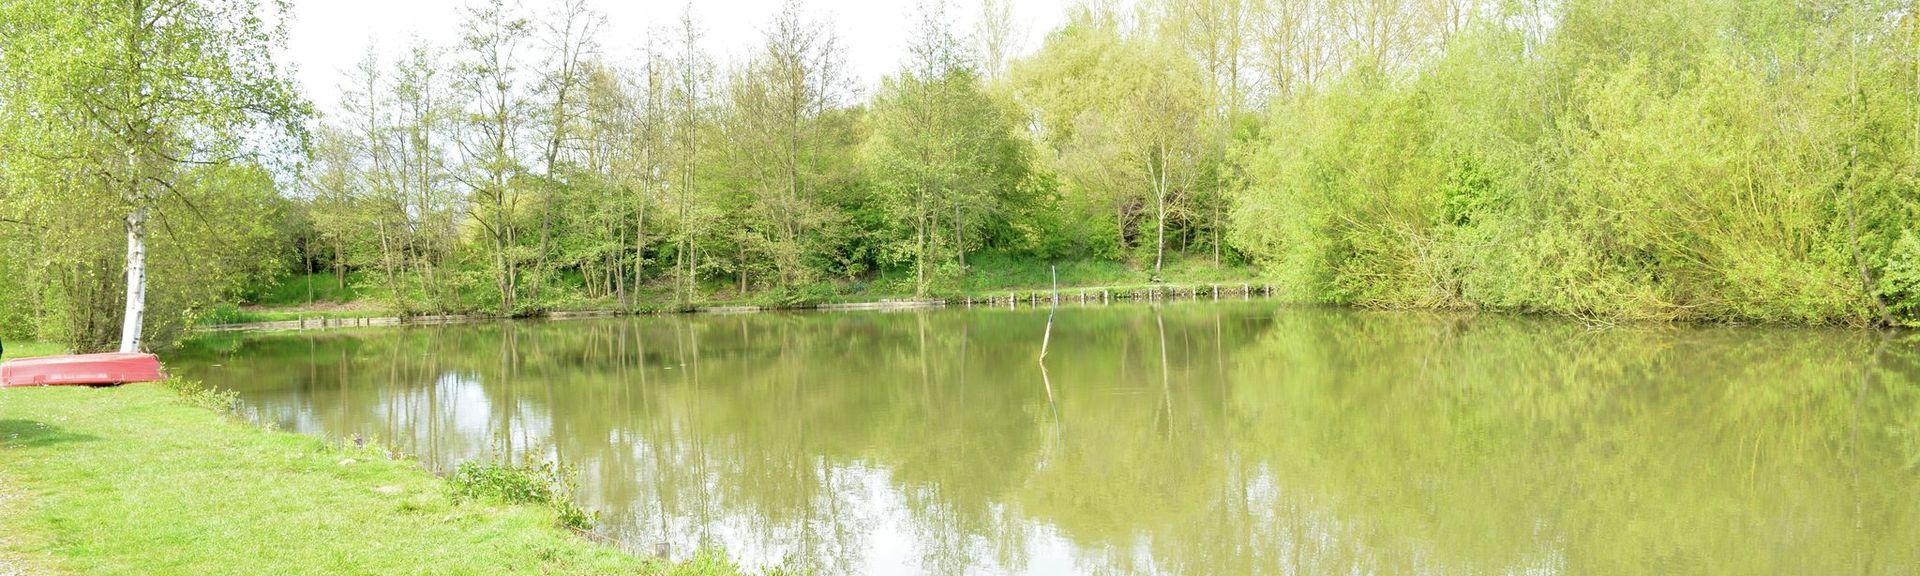 Jodoigne, Walloon Region, Belgium